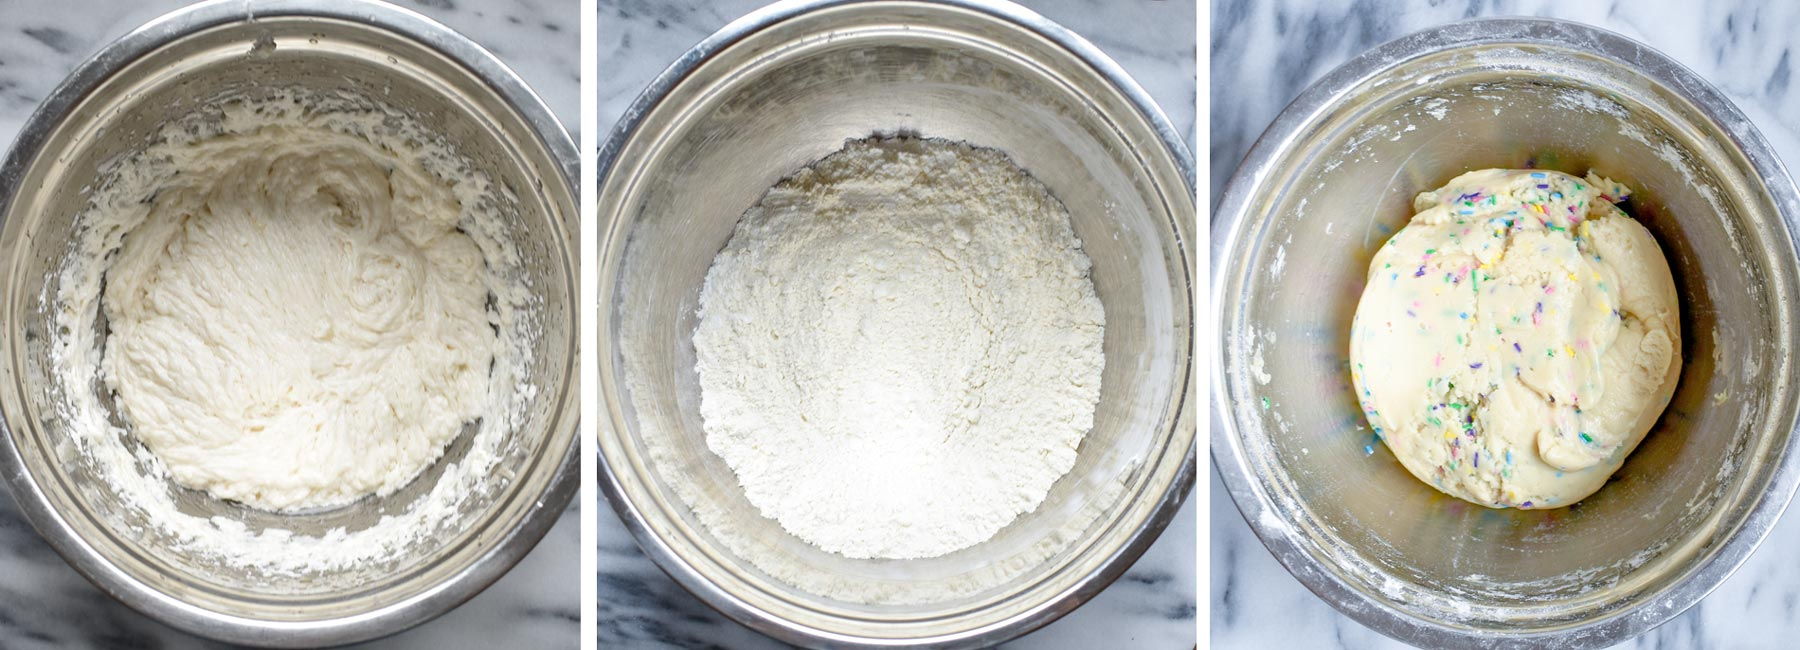 Allergy-Friendly funfetti sugar cookies method